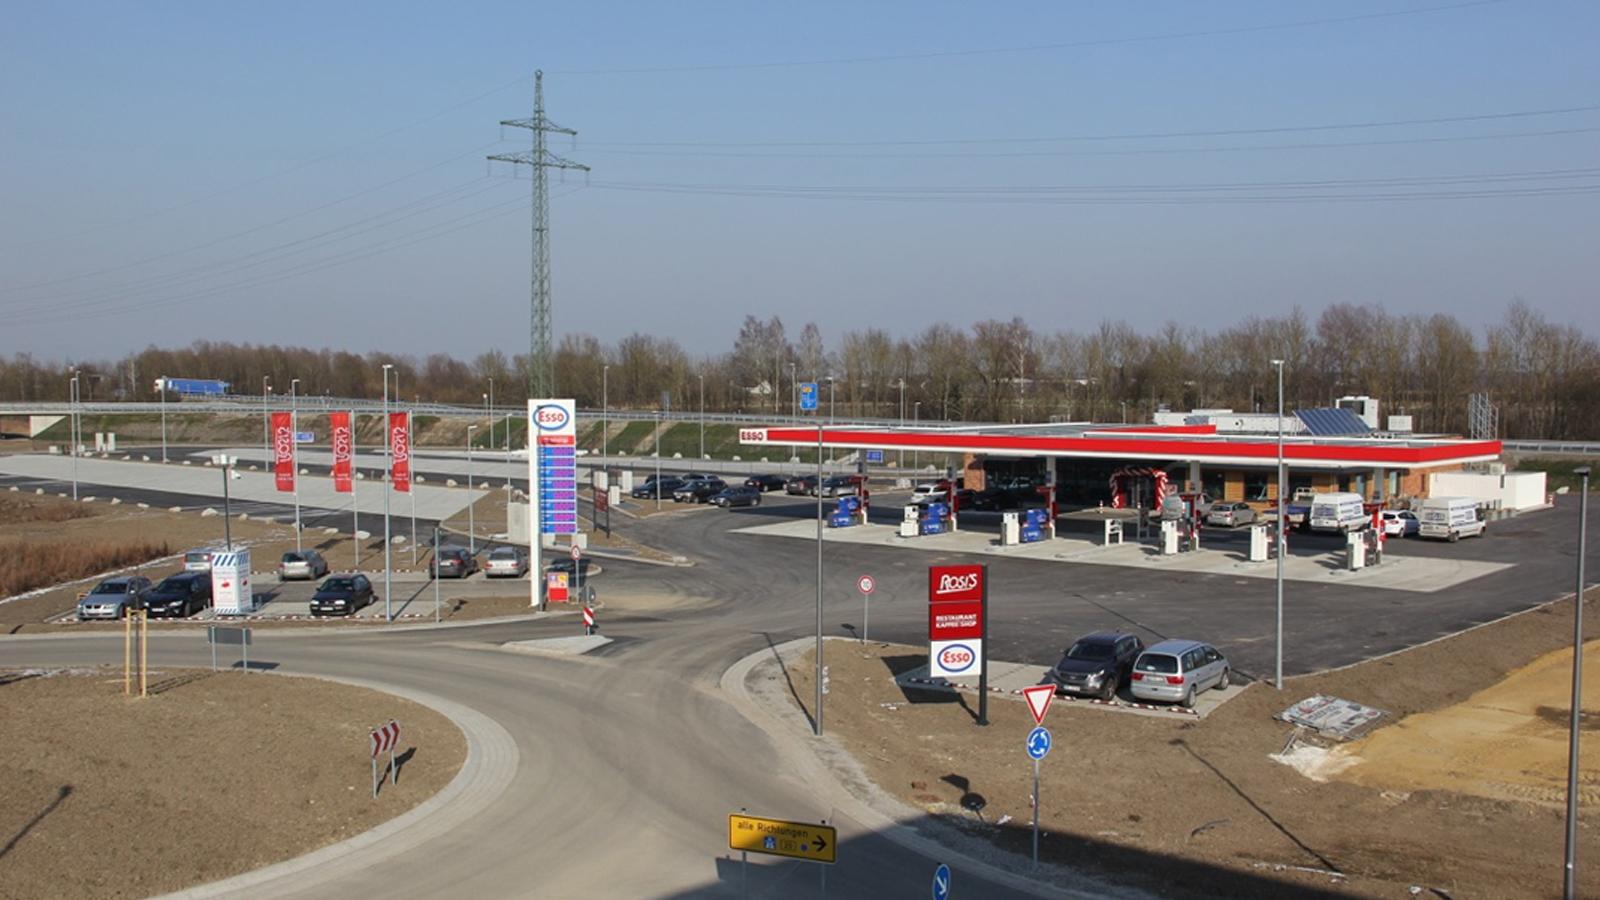 Architekt Bonn Autohof Tankstelle Pilsting , Architekt Bonn